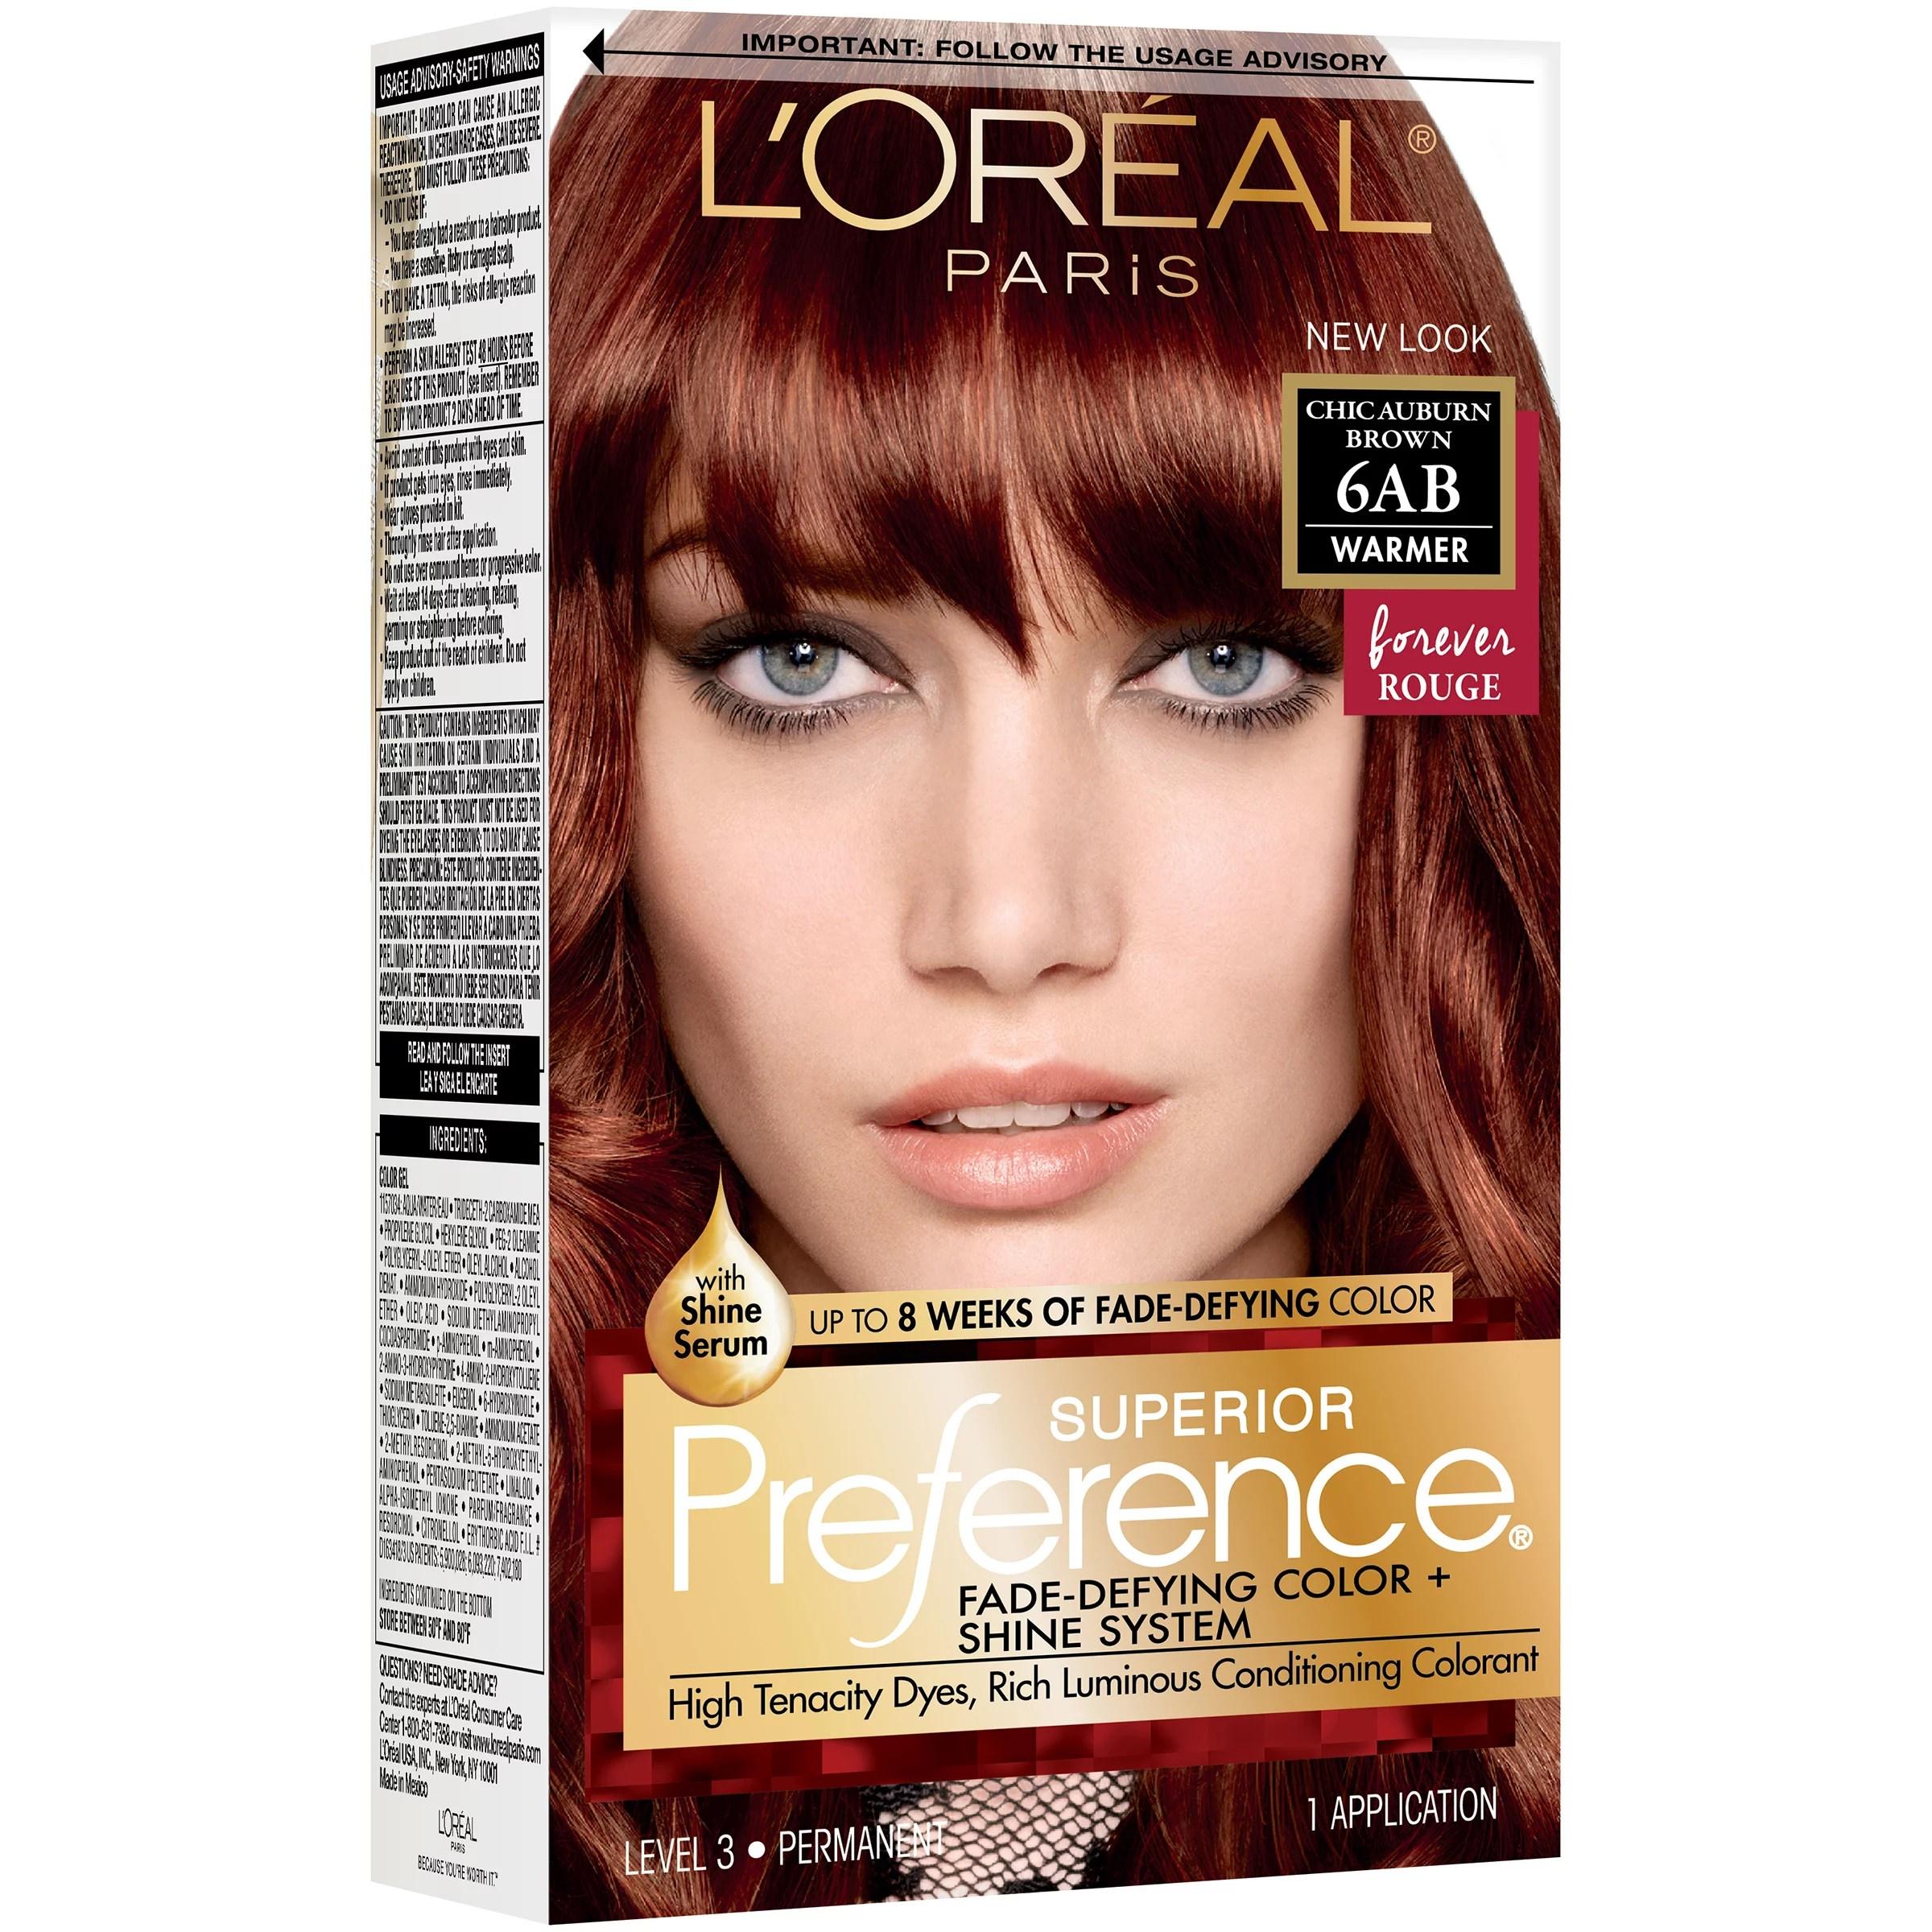 L Oreal Paris Superior Preference Permanent Hair Color 6ab Chic Auburn Brown Shop Hair Color At H E B